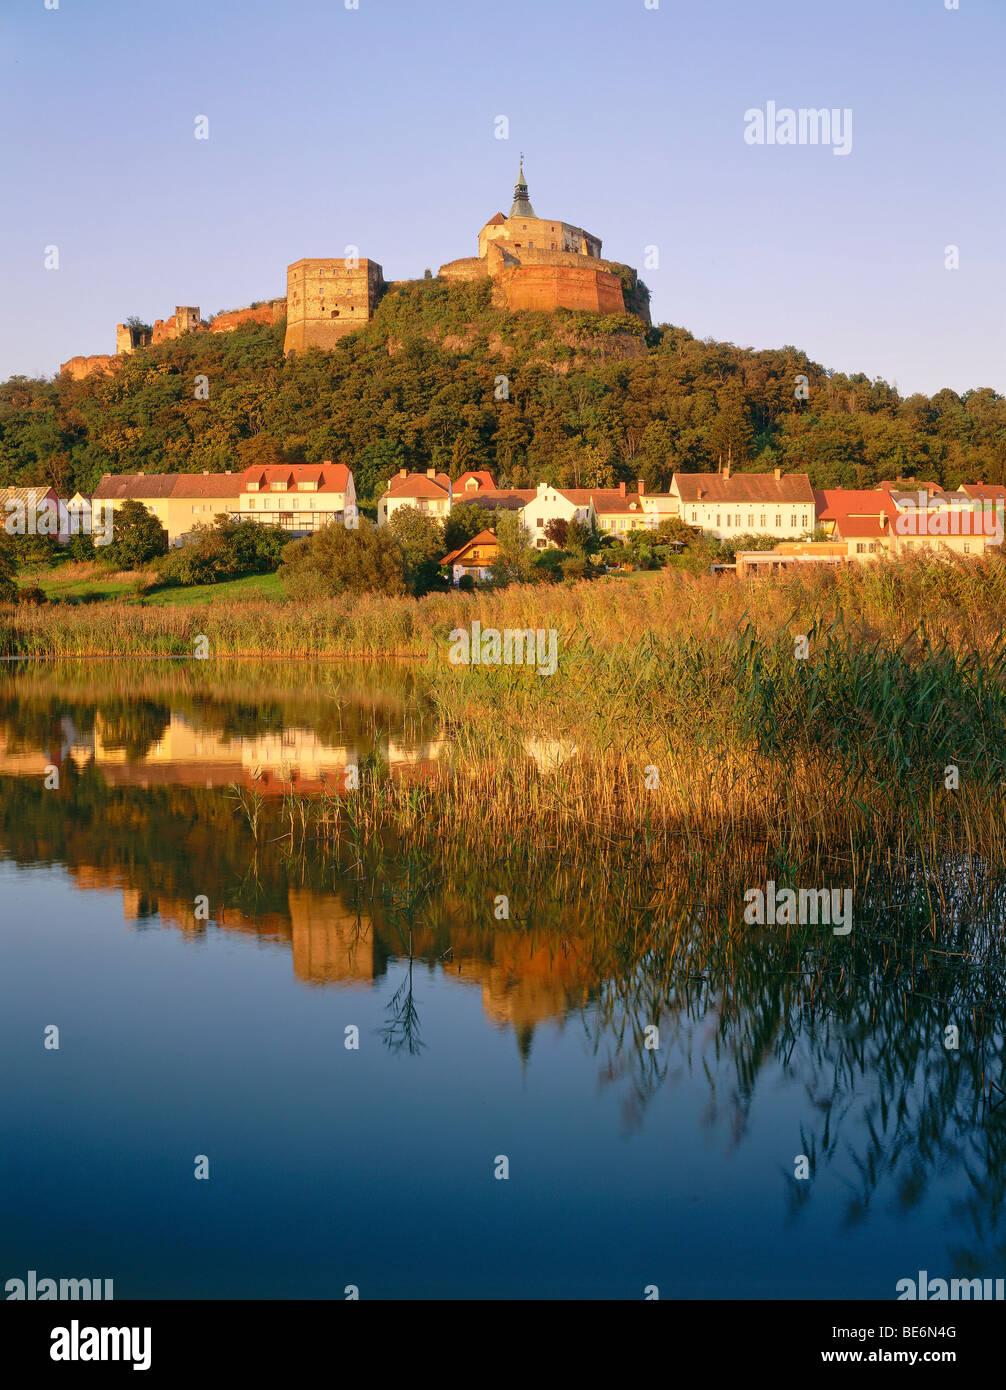 Burg Guessing castle, Burgenland, Austria, Europe - Stock Image